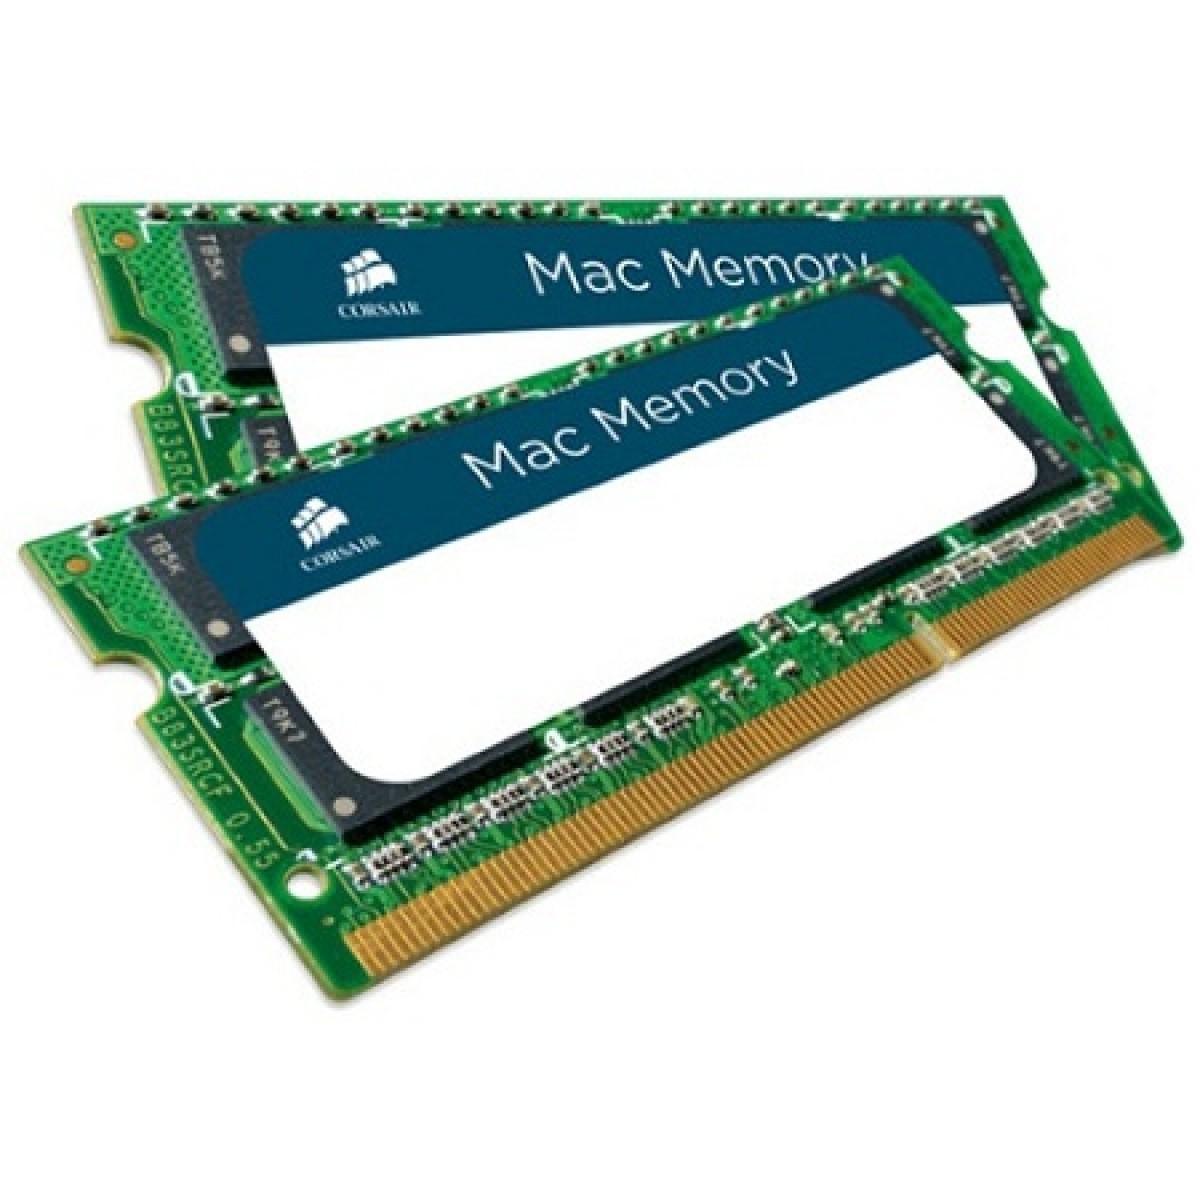 Corsair 16GB CMSA16GX3M2A1333C9 Mac Memory, 1333MHz CL9 DDR3 SO-DIMM ...